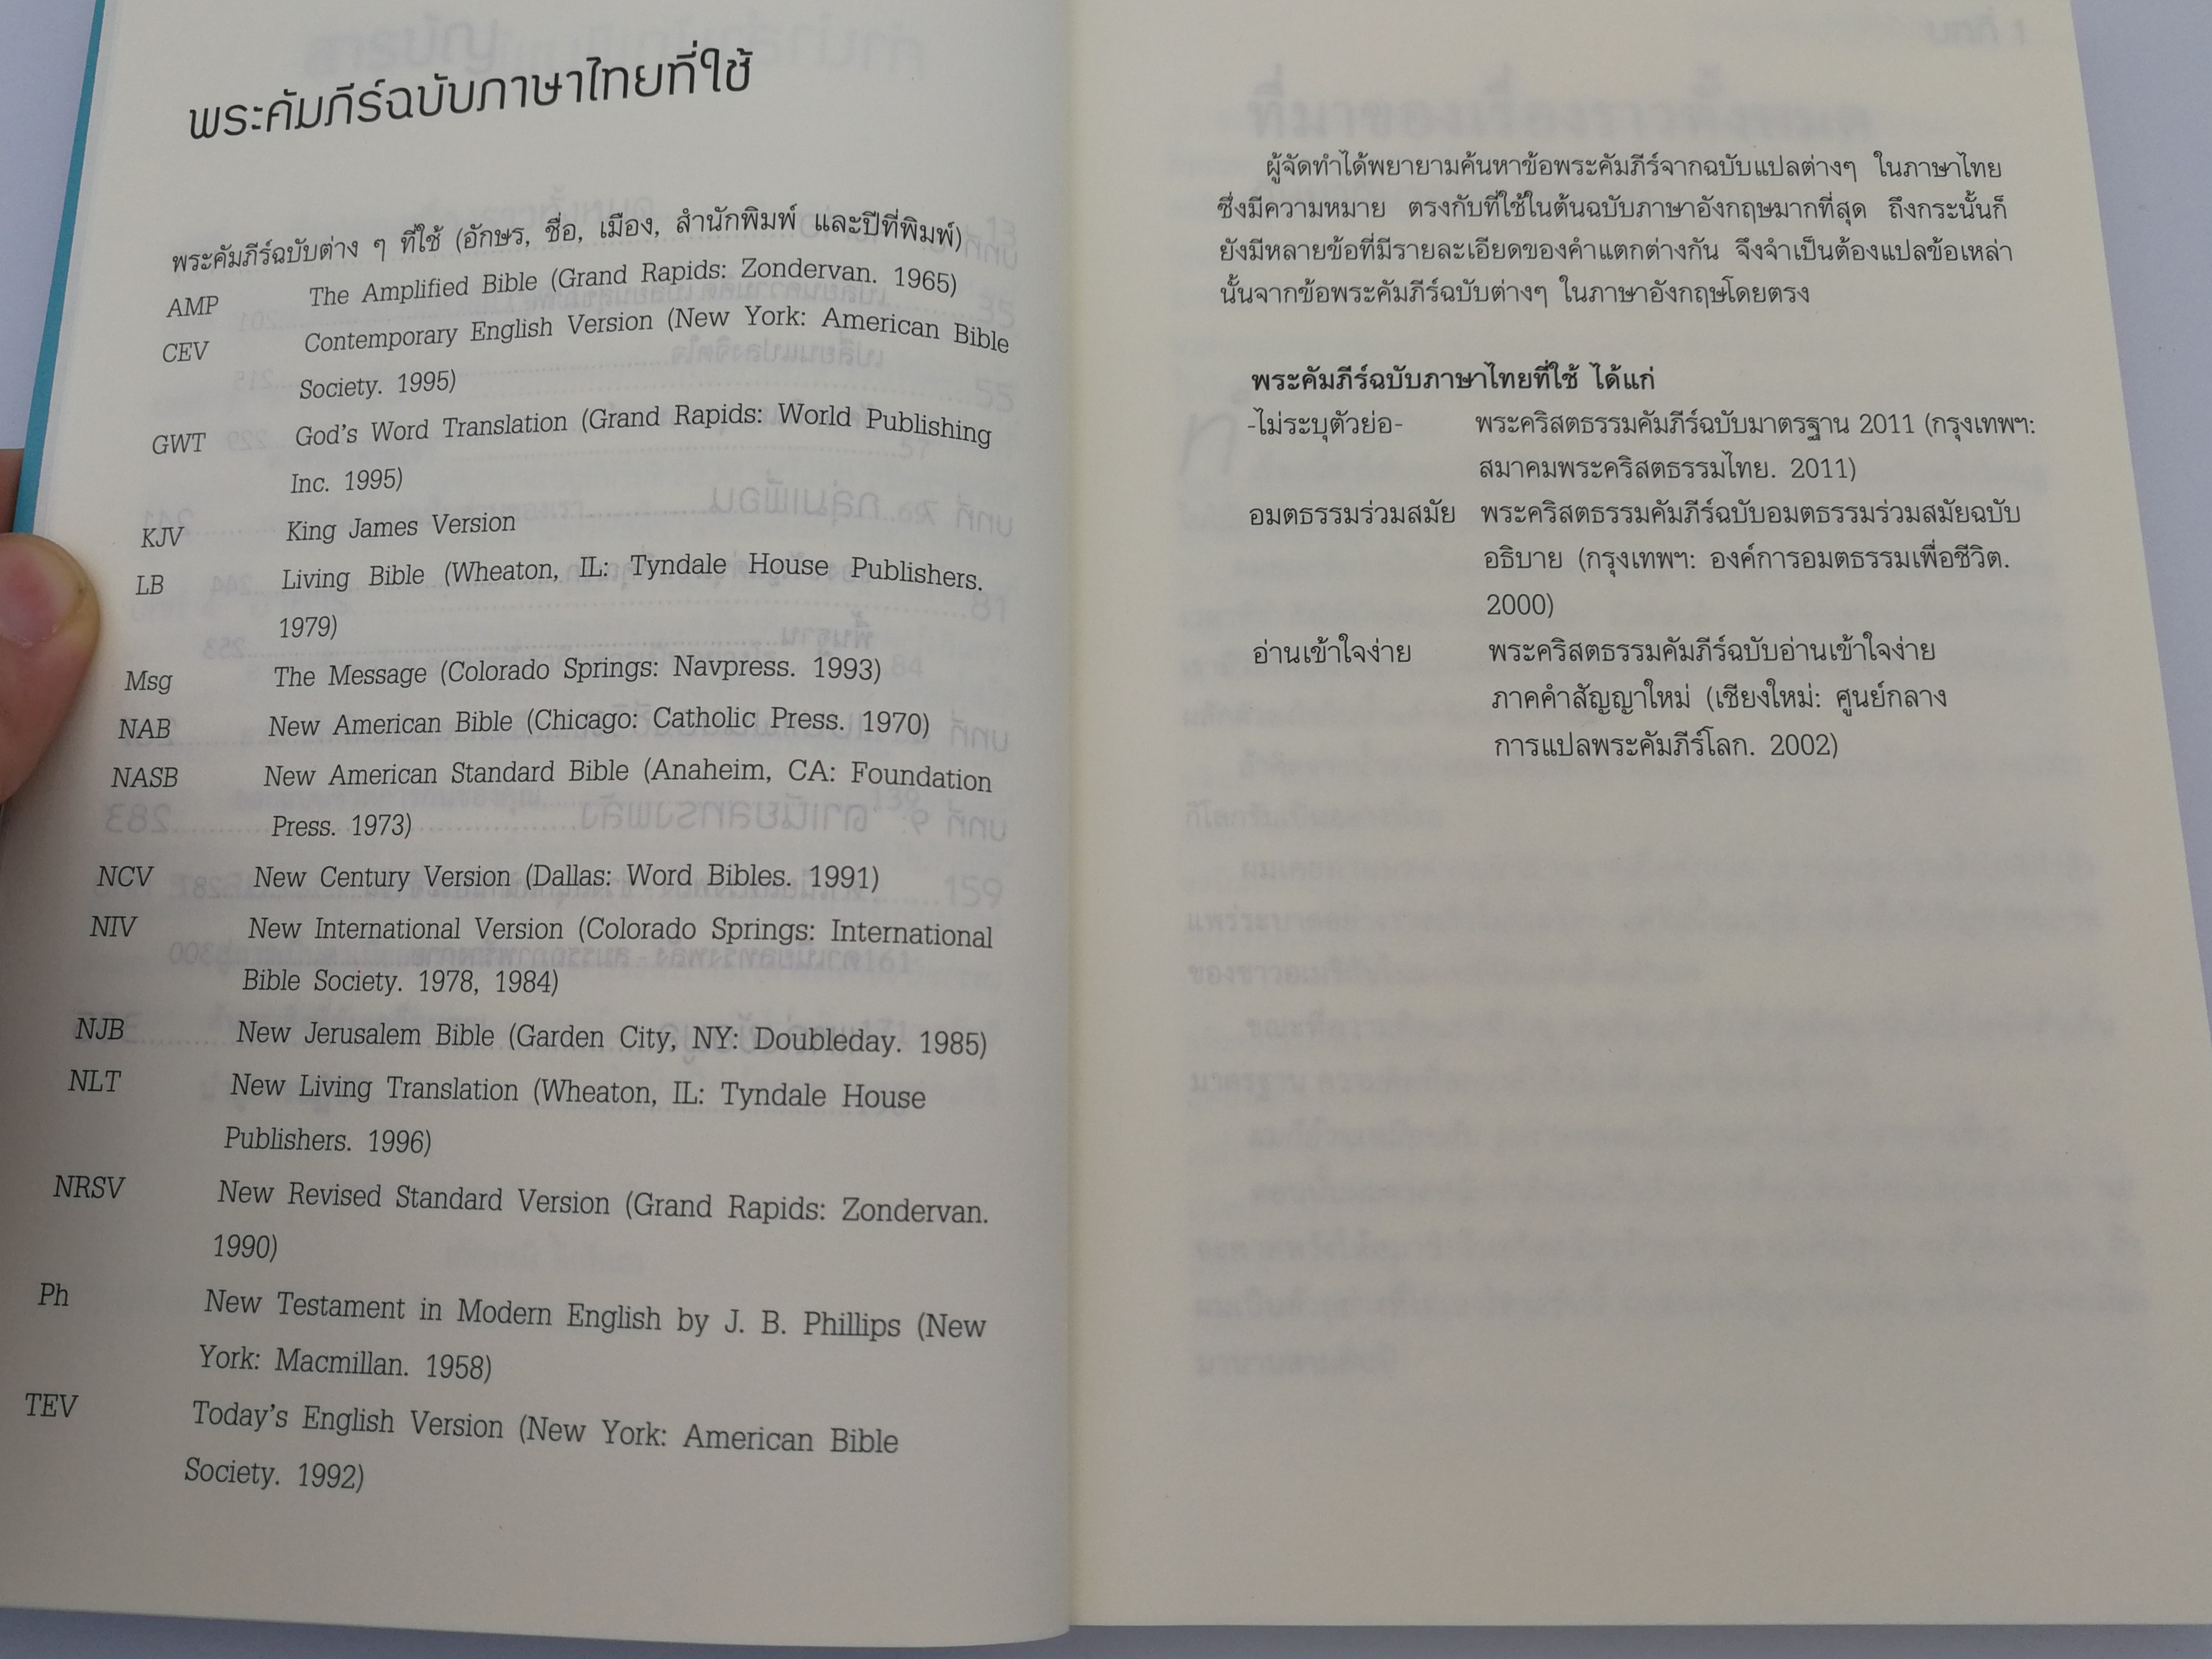 -ced-thai-language-edition-of-the-daniel-plan-6.jpg